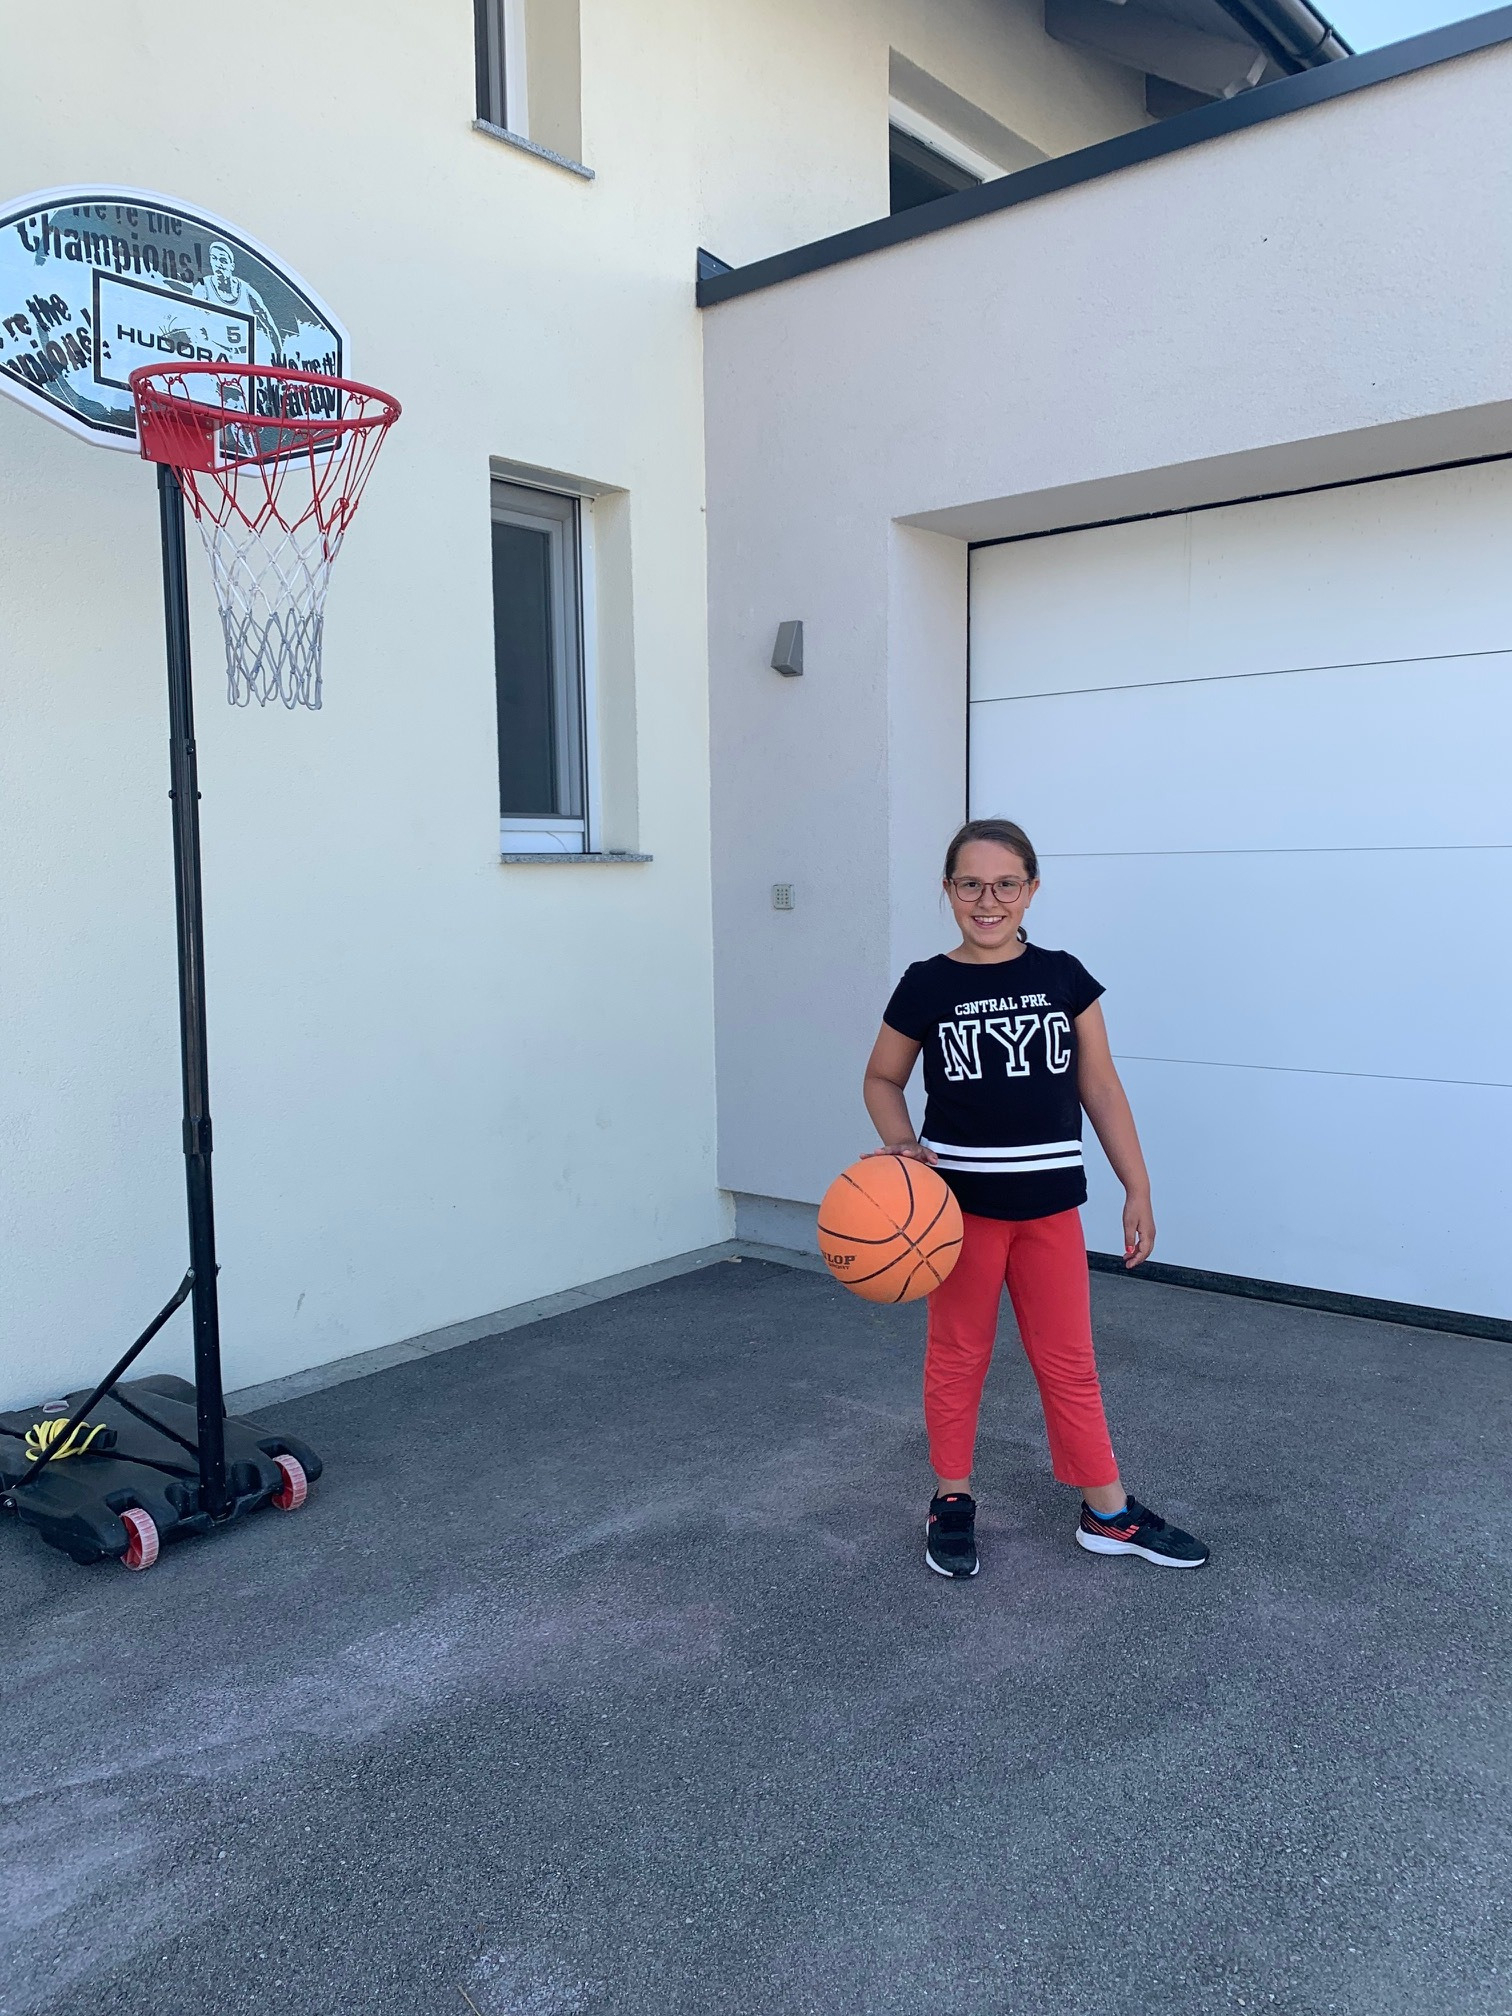 Basketball_3a_2_edited.jpg